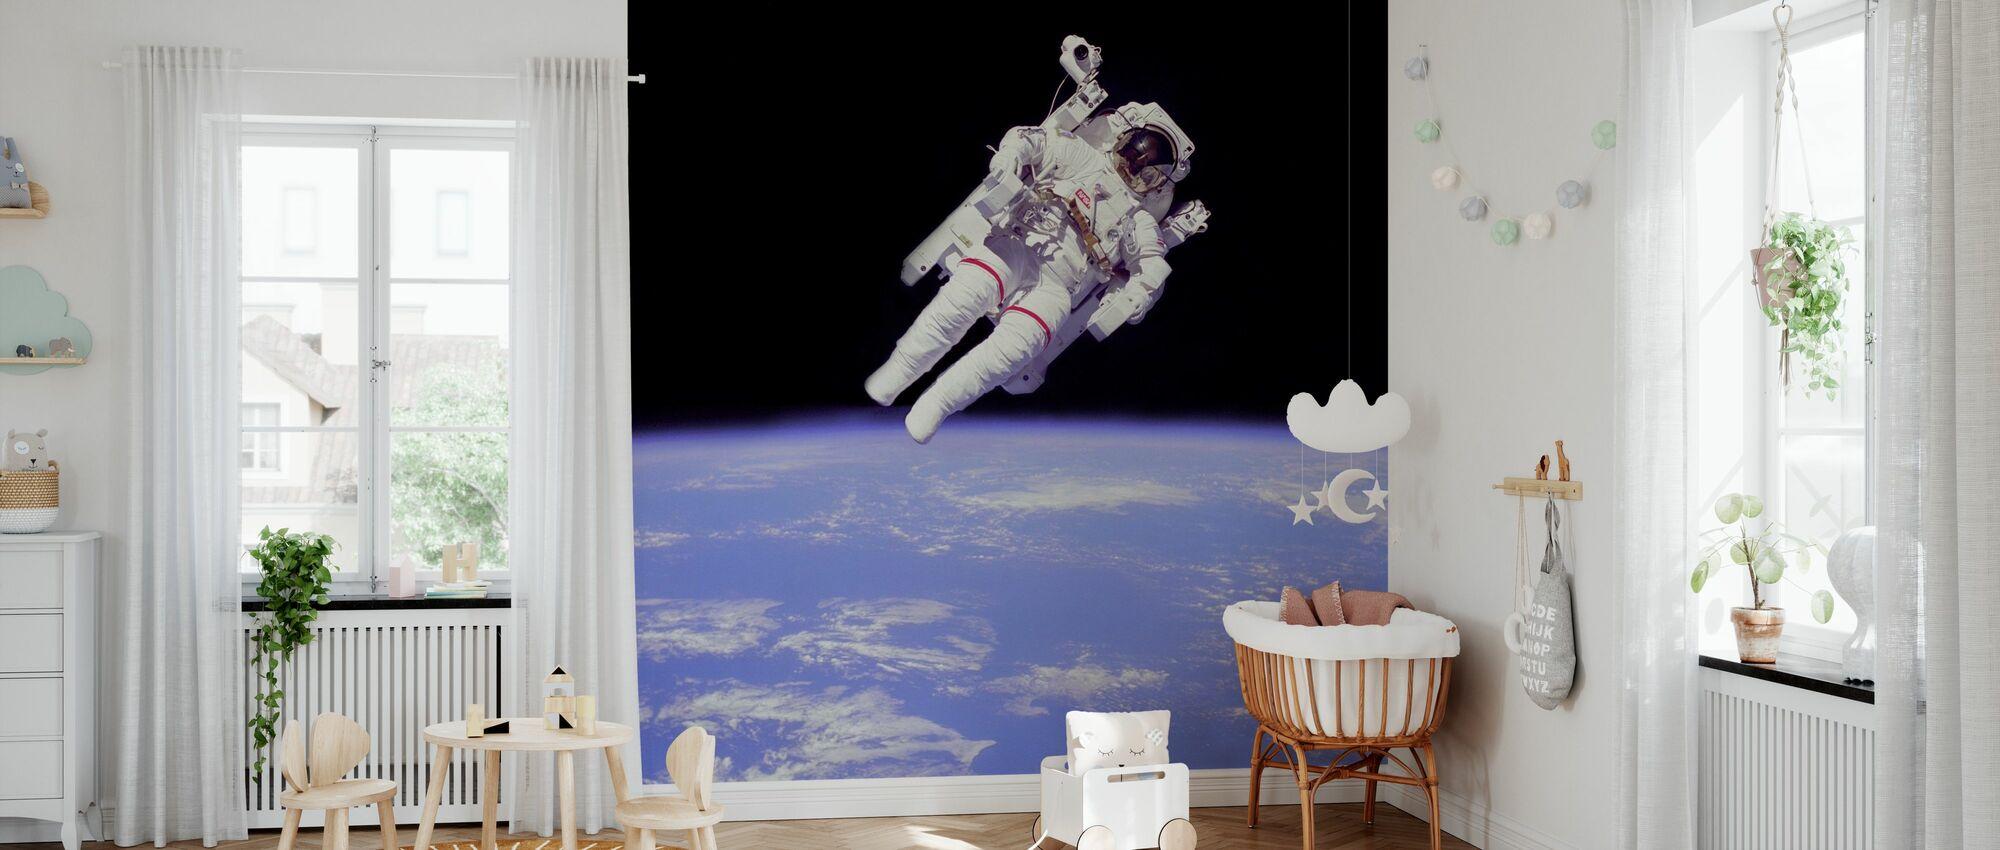 Astronaut - Wallpaper - Nursery